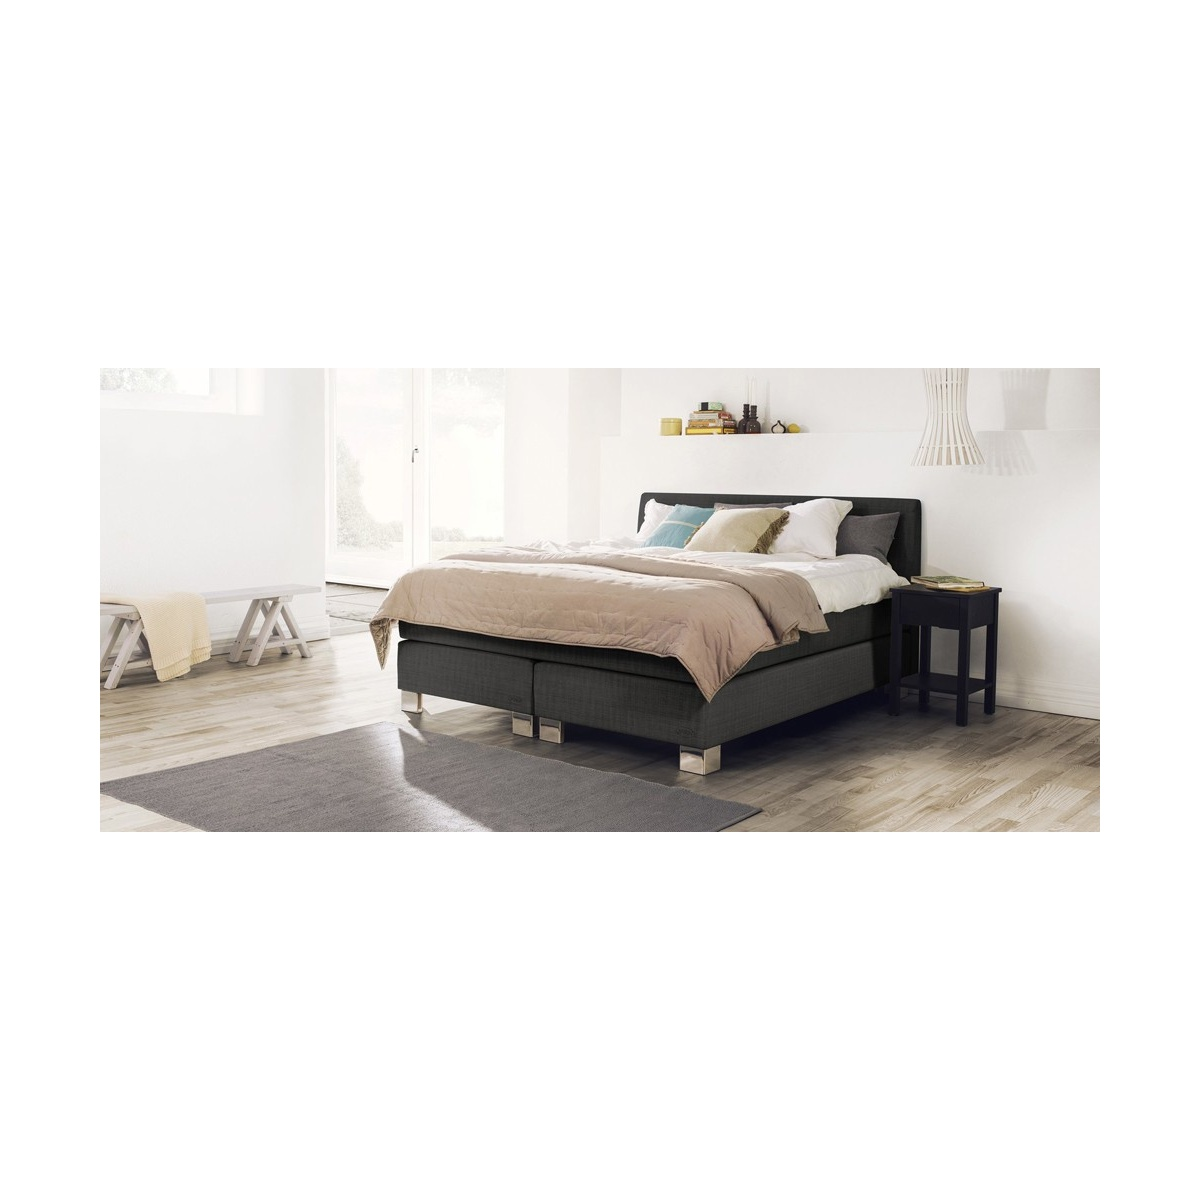 ko kontynentalne diplomat continental jensen. Black Bedroom Furniture Sets. Home Design Ideas